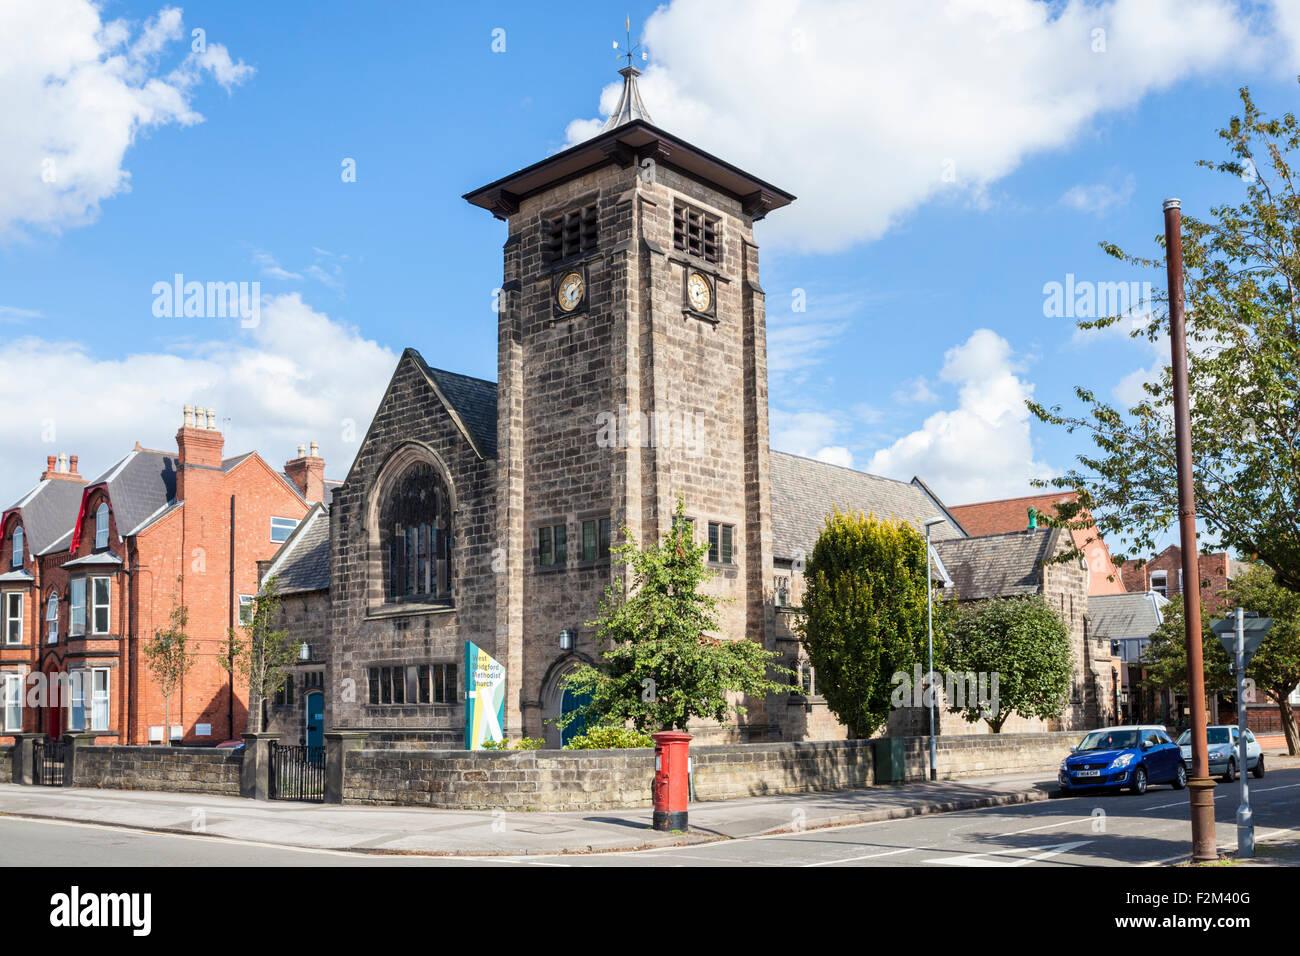 The Grade ii listed Methodist Church, West Bridgford, Nottinghamshire, England, UK - Stock Image